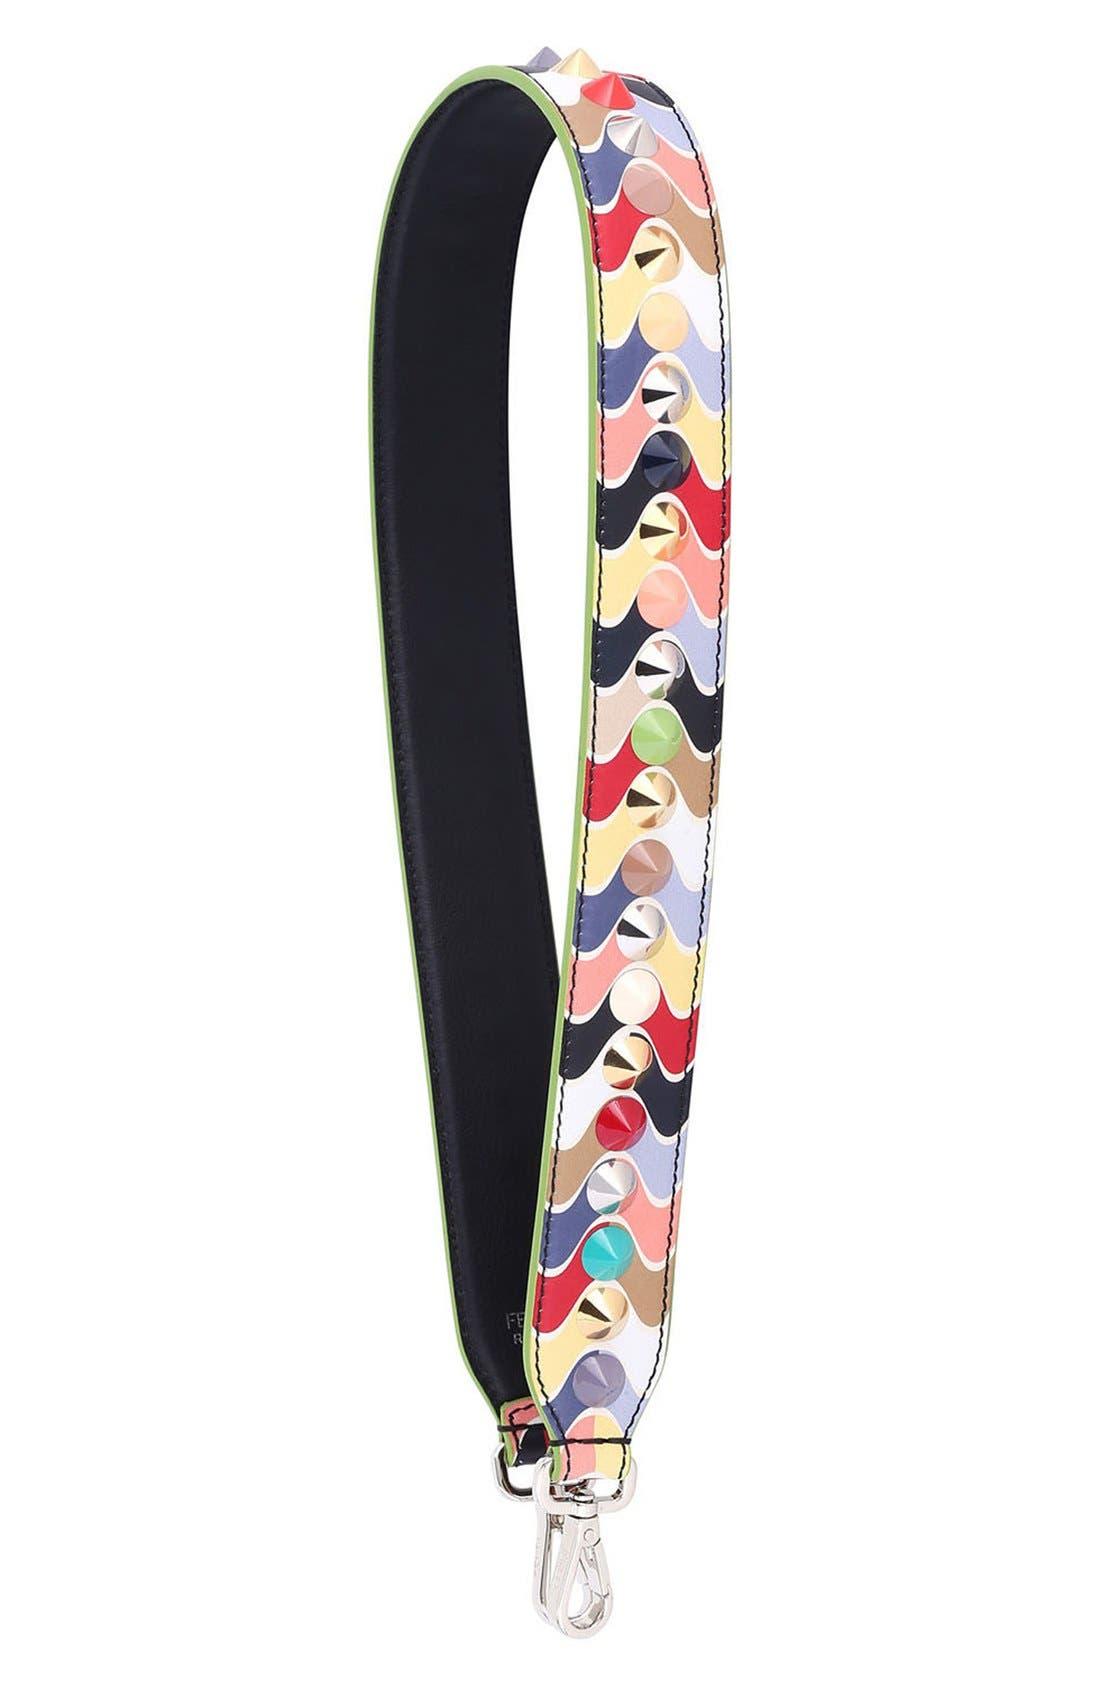 Main Image - Fendi Strap You Wave Stud Leather Guitar Bag Strap